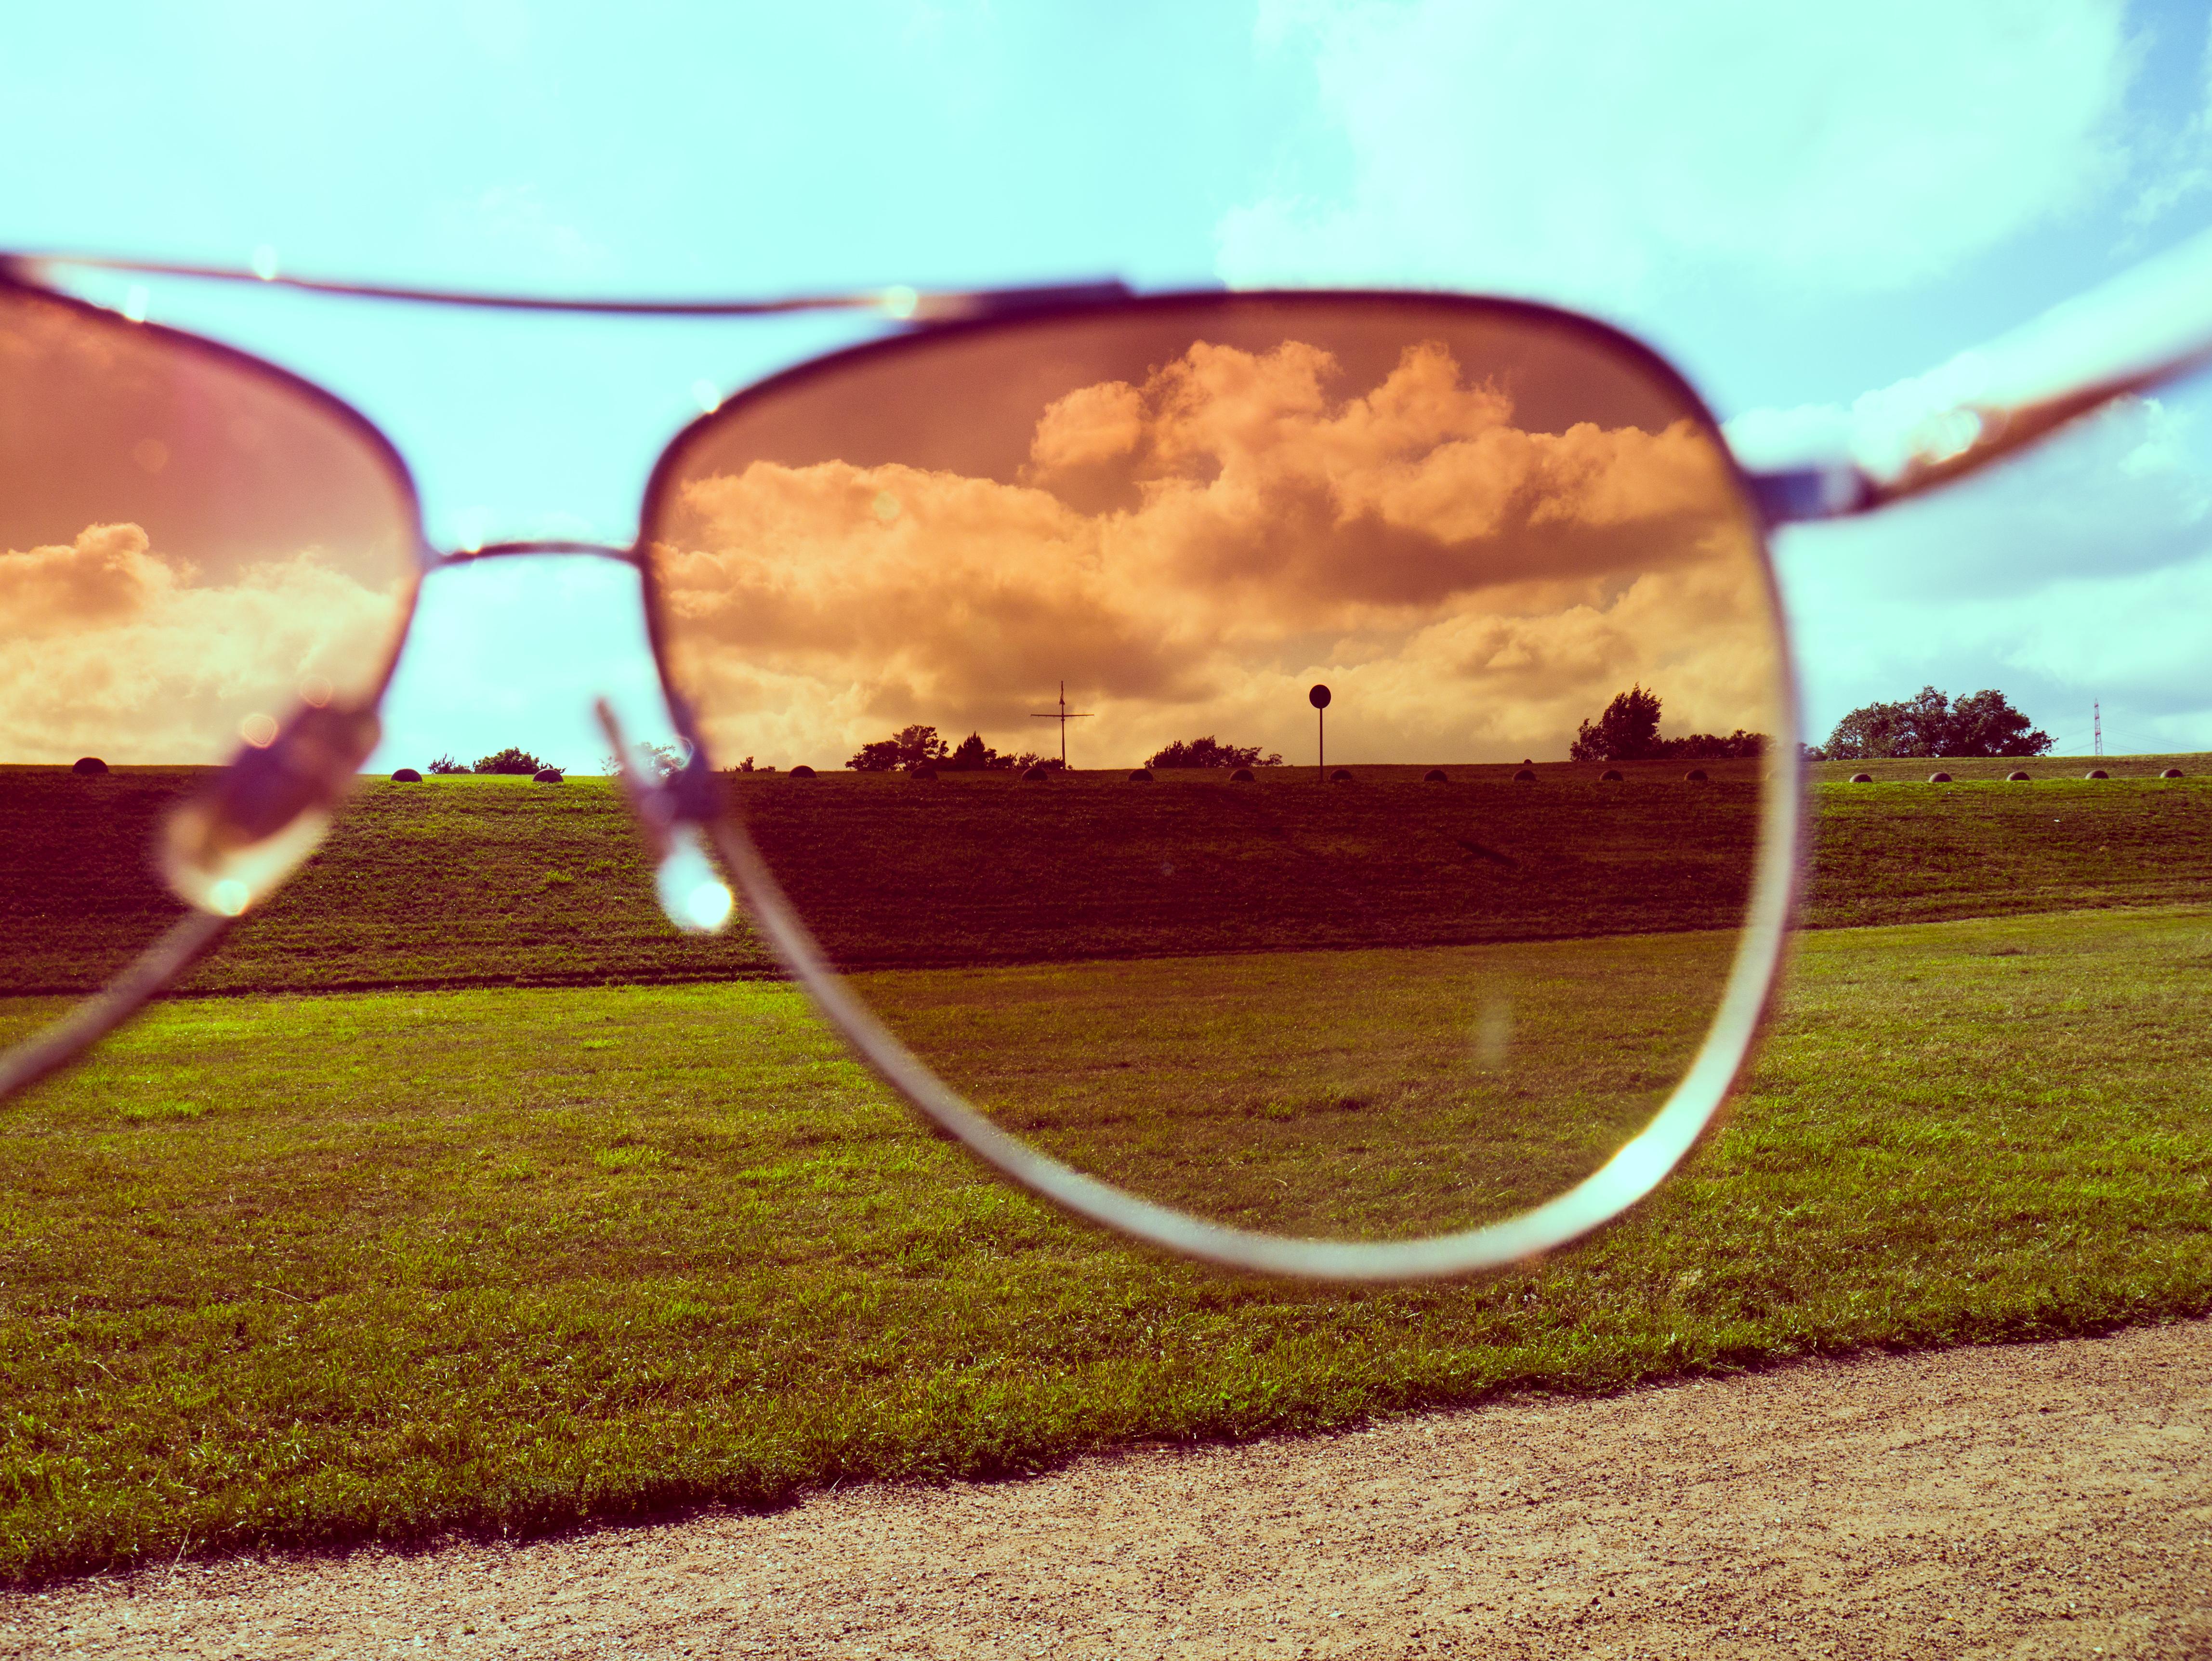 sunglasses - original